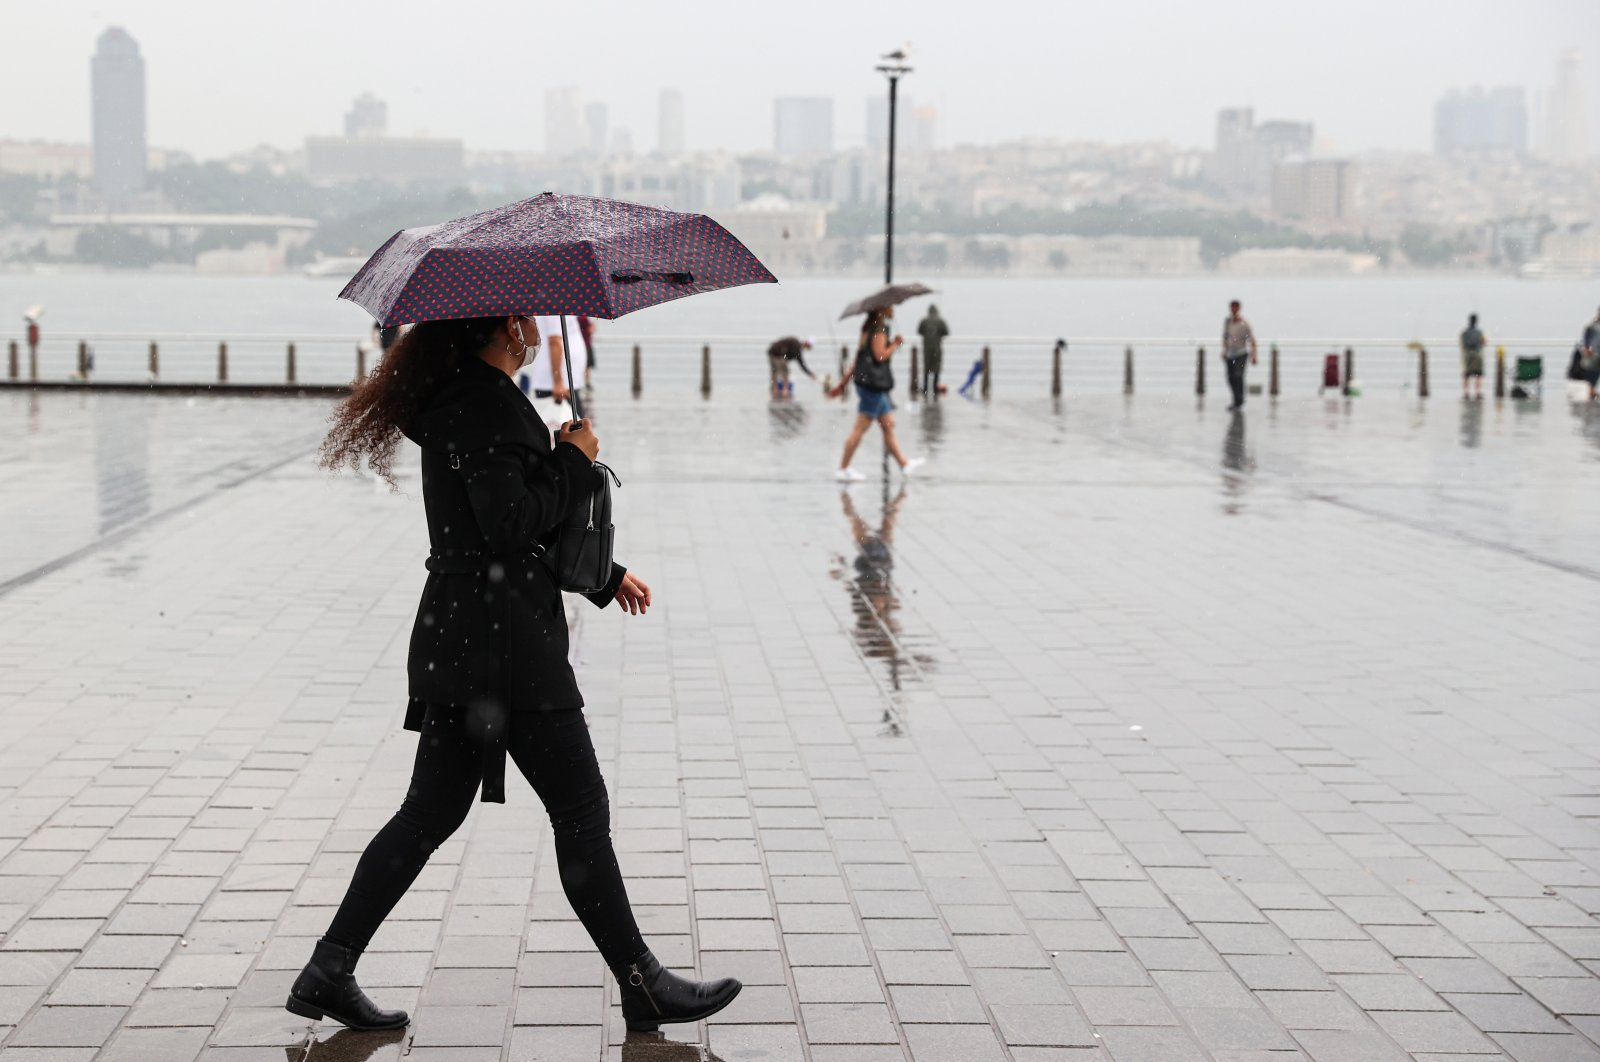 A woman walks in the rain, in Istanbul, Turkey, July 6, 2021. (AA PHOTO)